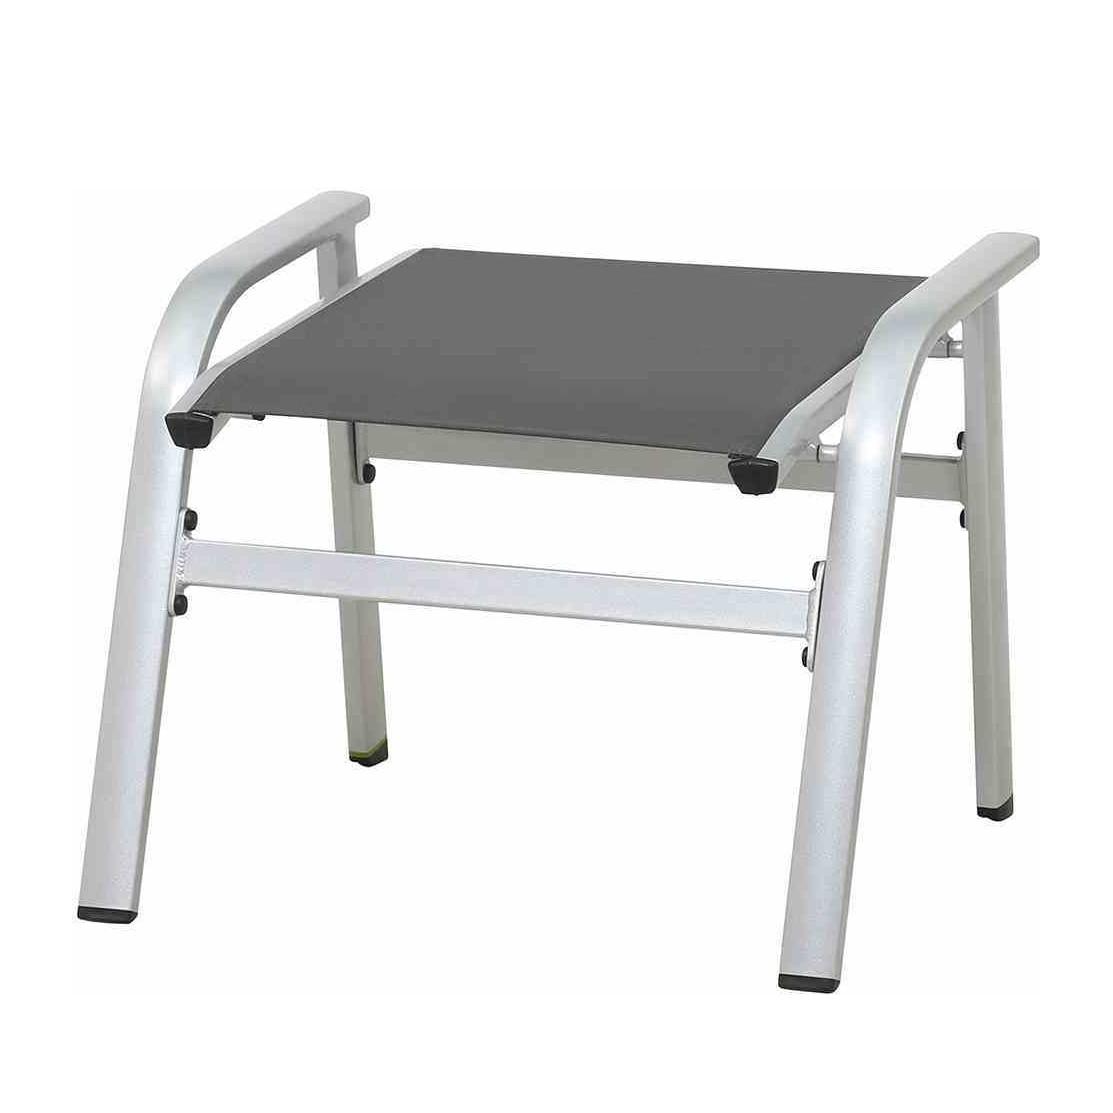 Hocker Core - Kunstfaser / Aluminium - Dunkelgrau / Silber, Mwh